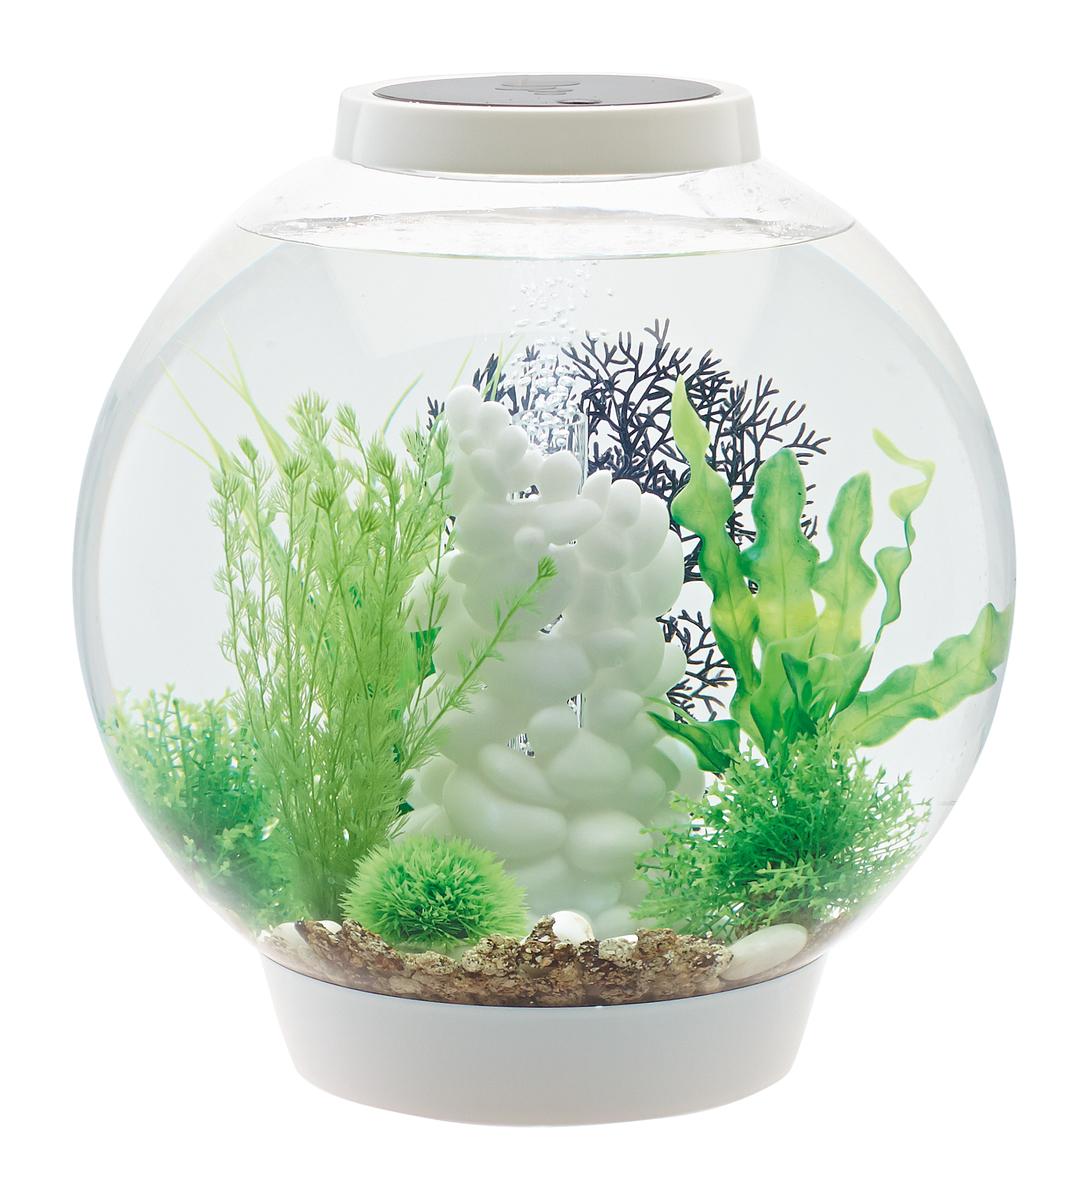 biOrb Aquarieum Classic 30 MCR weiß